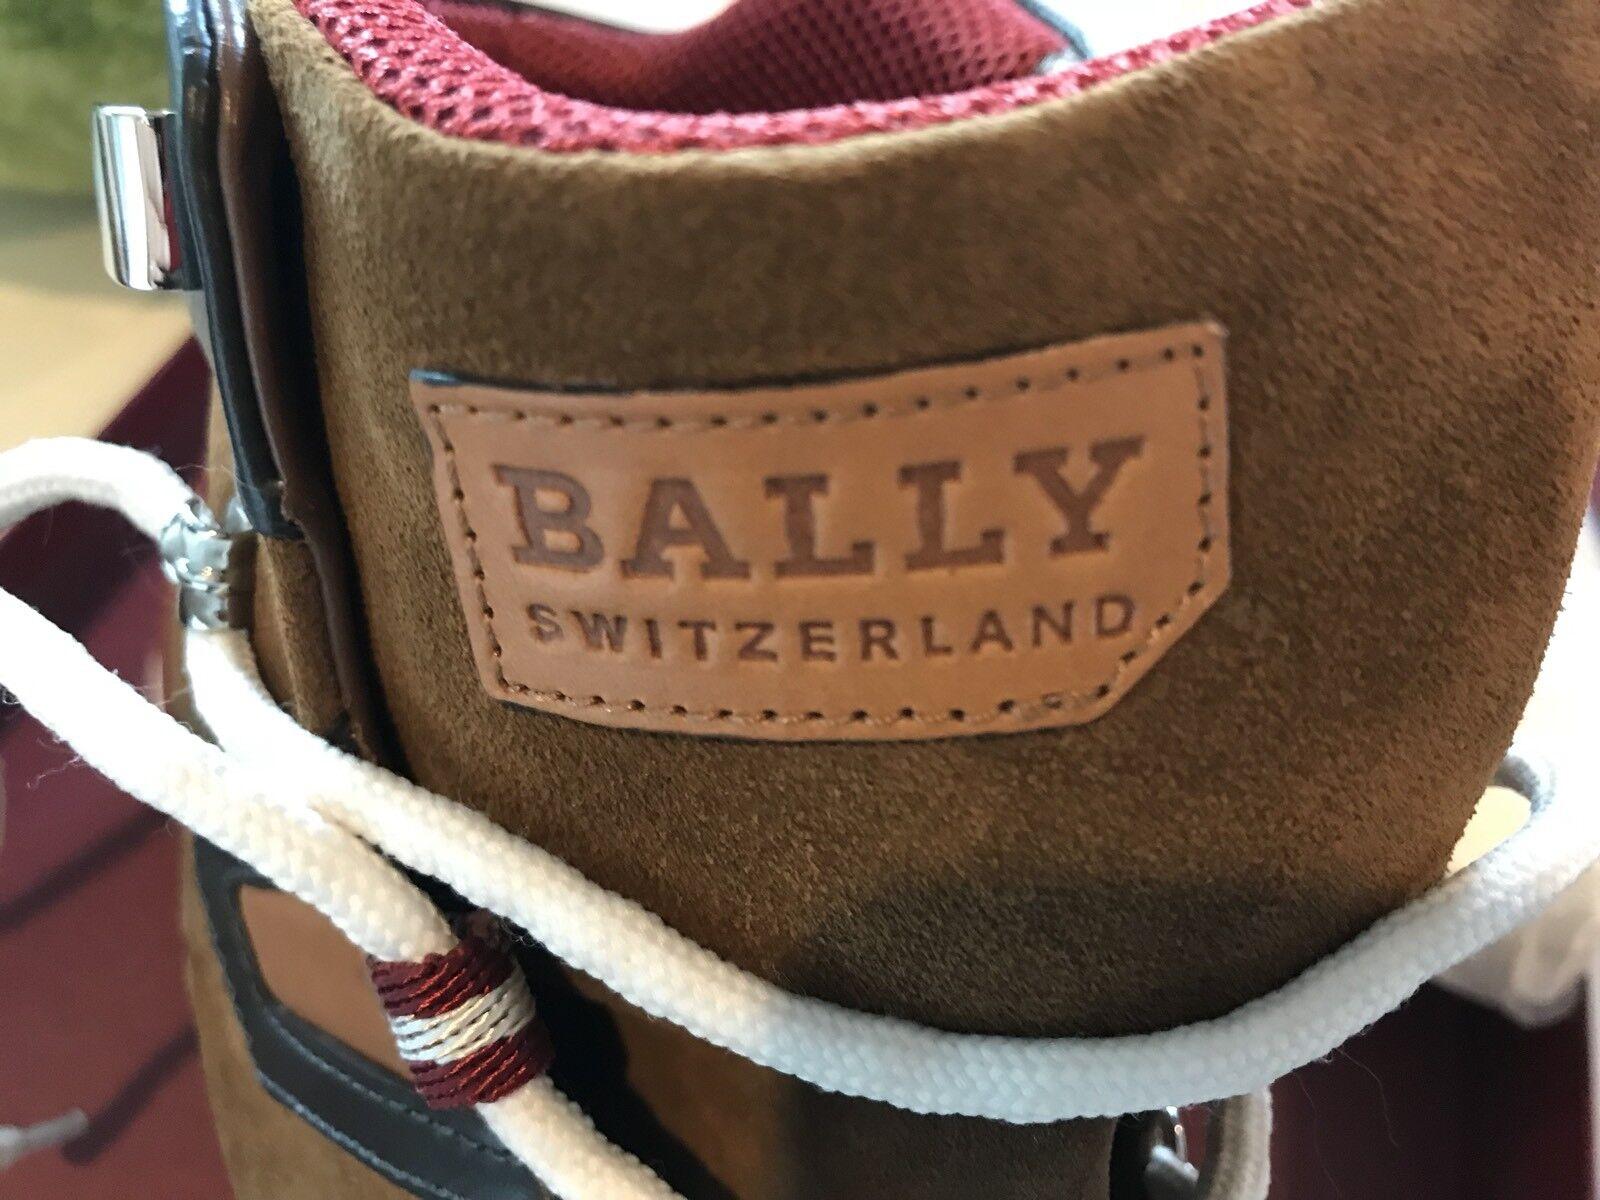 700  Bally Avyd Khaki Suede Ginnastica High Tops Scarpe da Ginnastica Suede size US 10.5 Made in Italy 0fe068